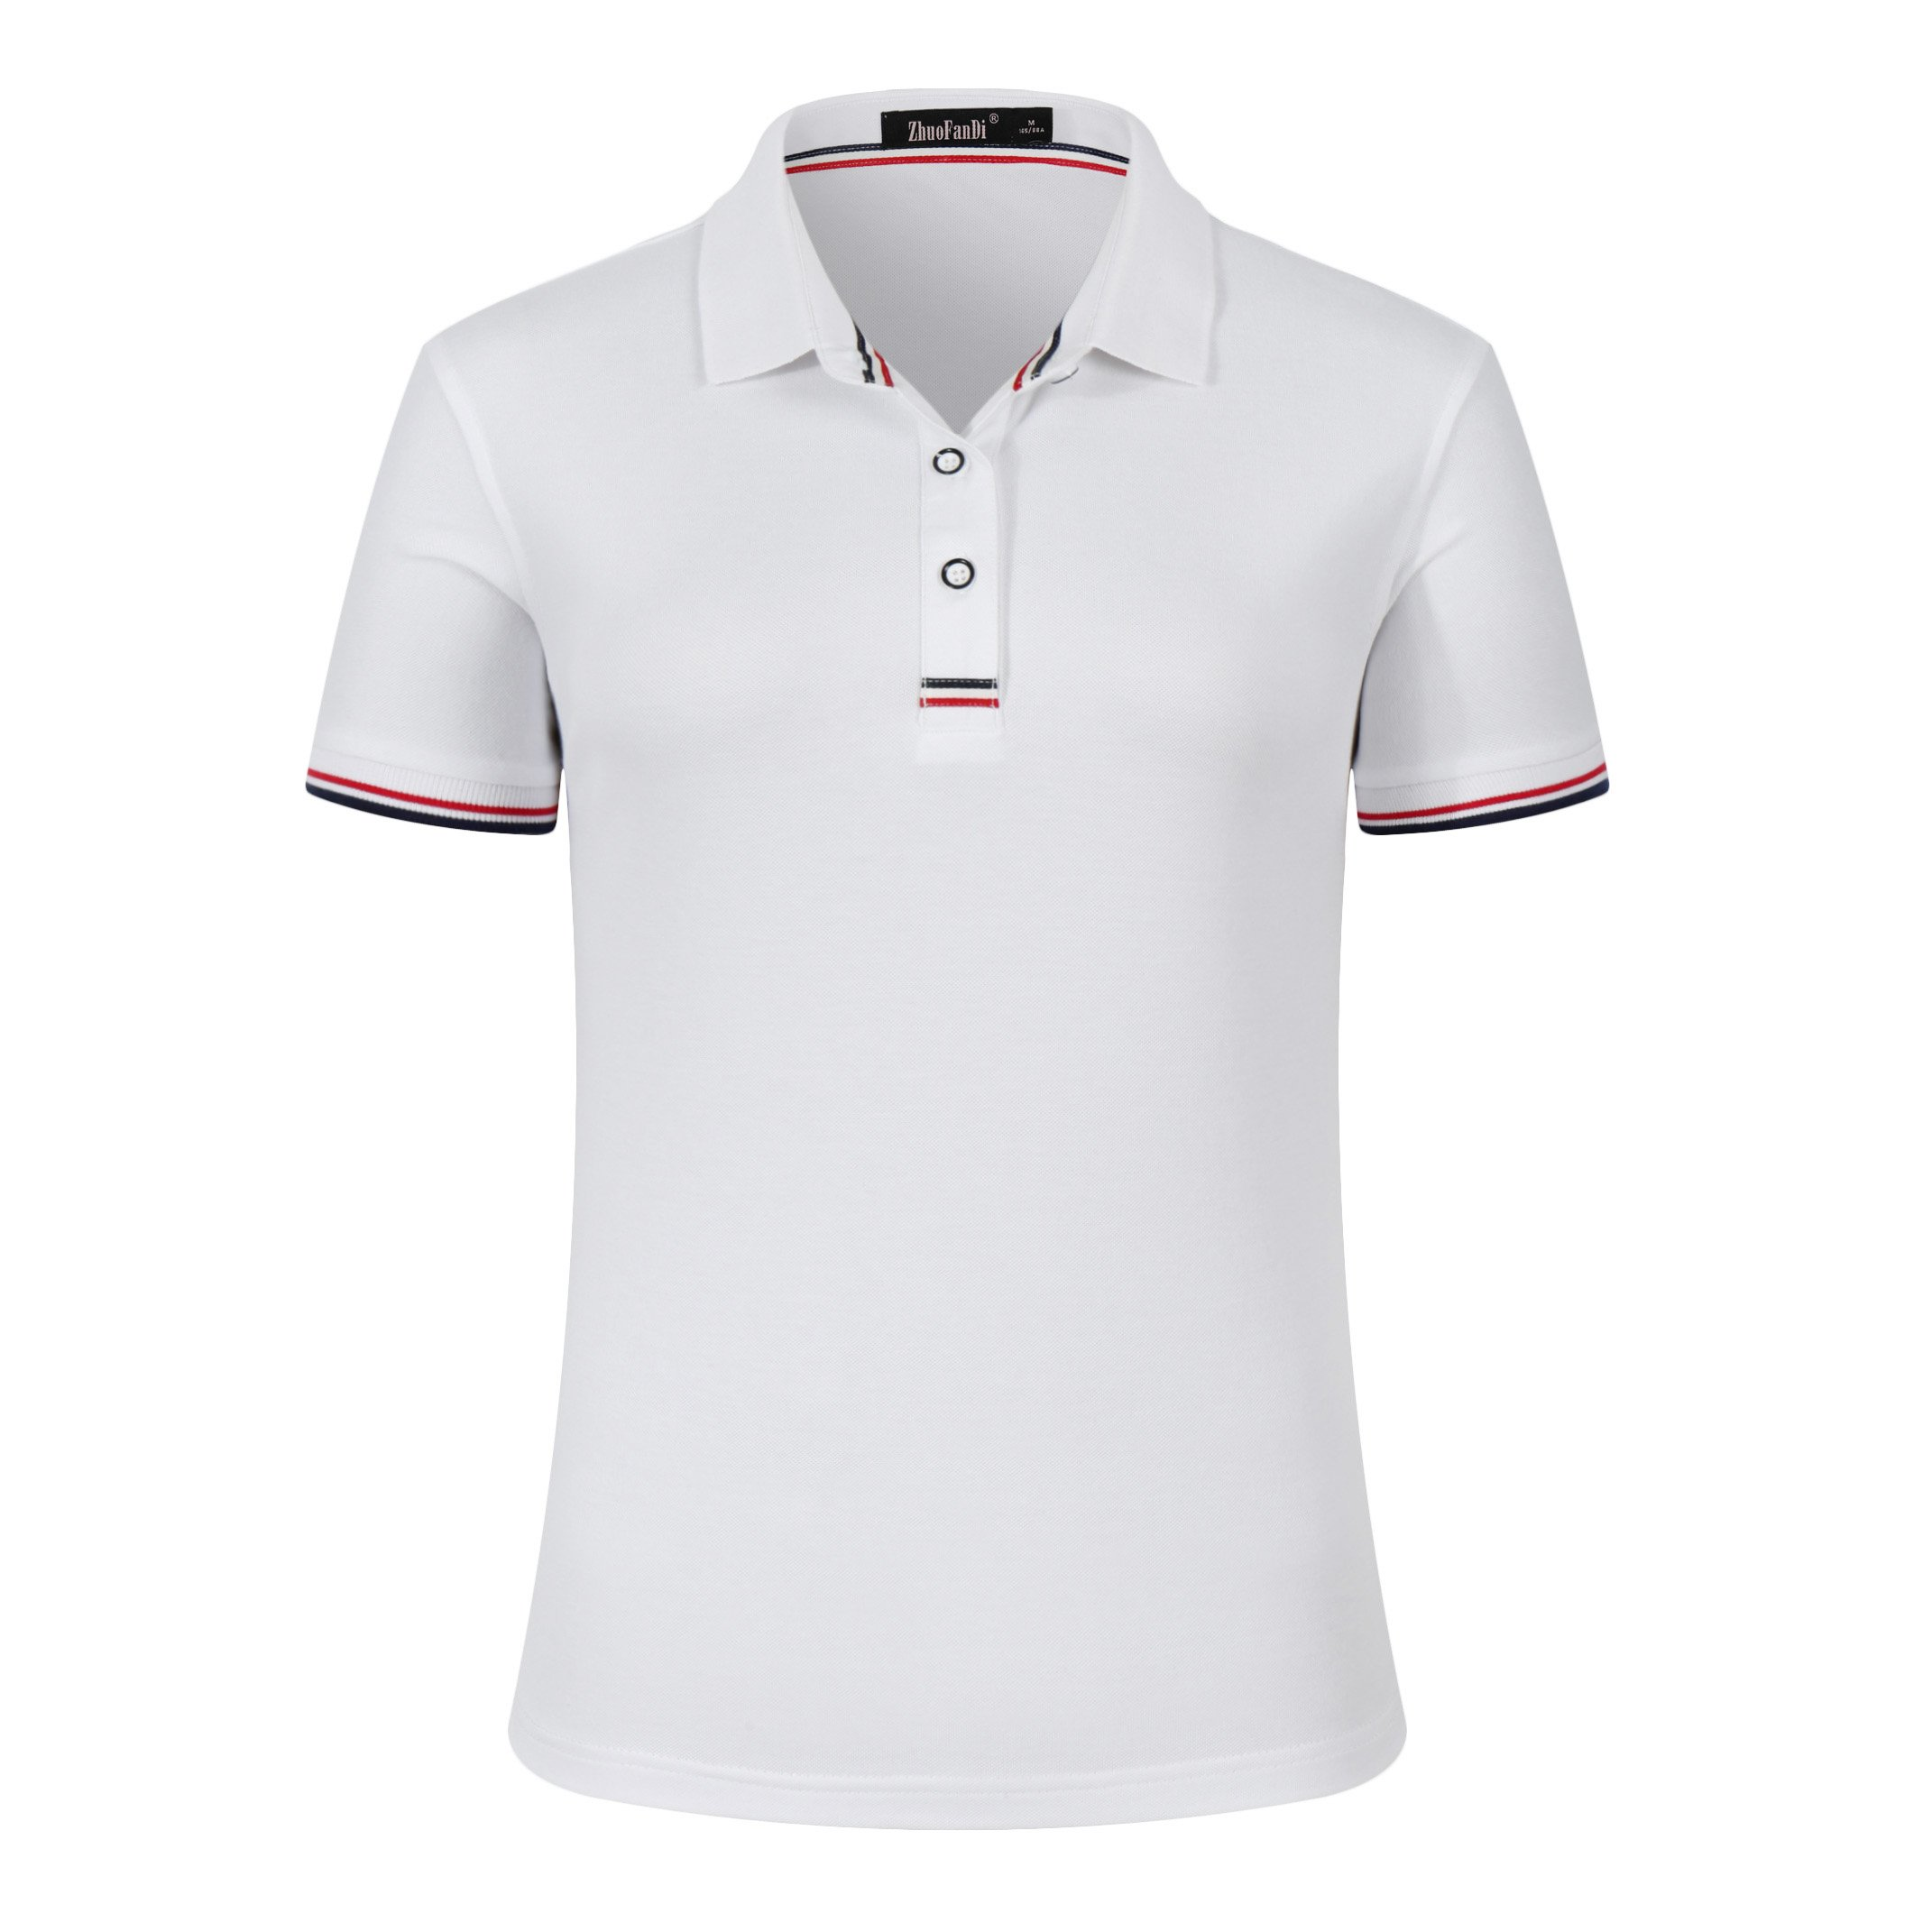 Mitario Femiego Women Classic Rainbow Collar Slim Fit Short Golf Polo Shirt White S